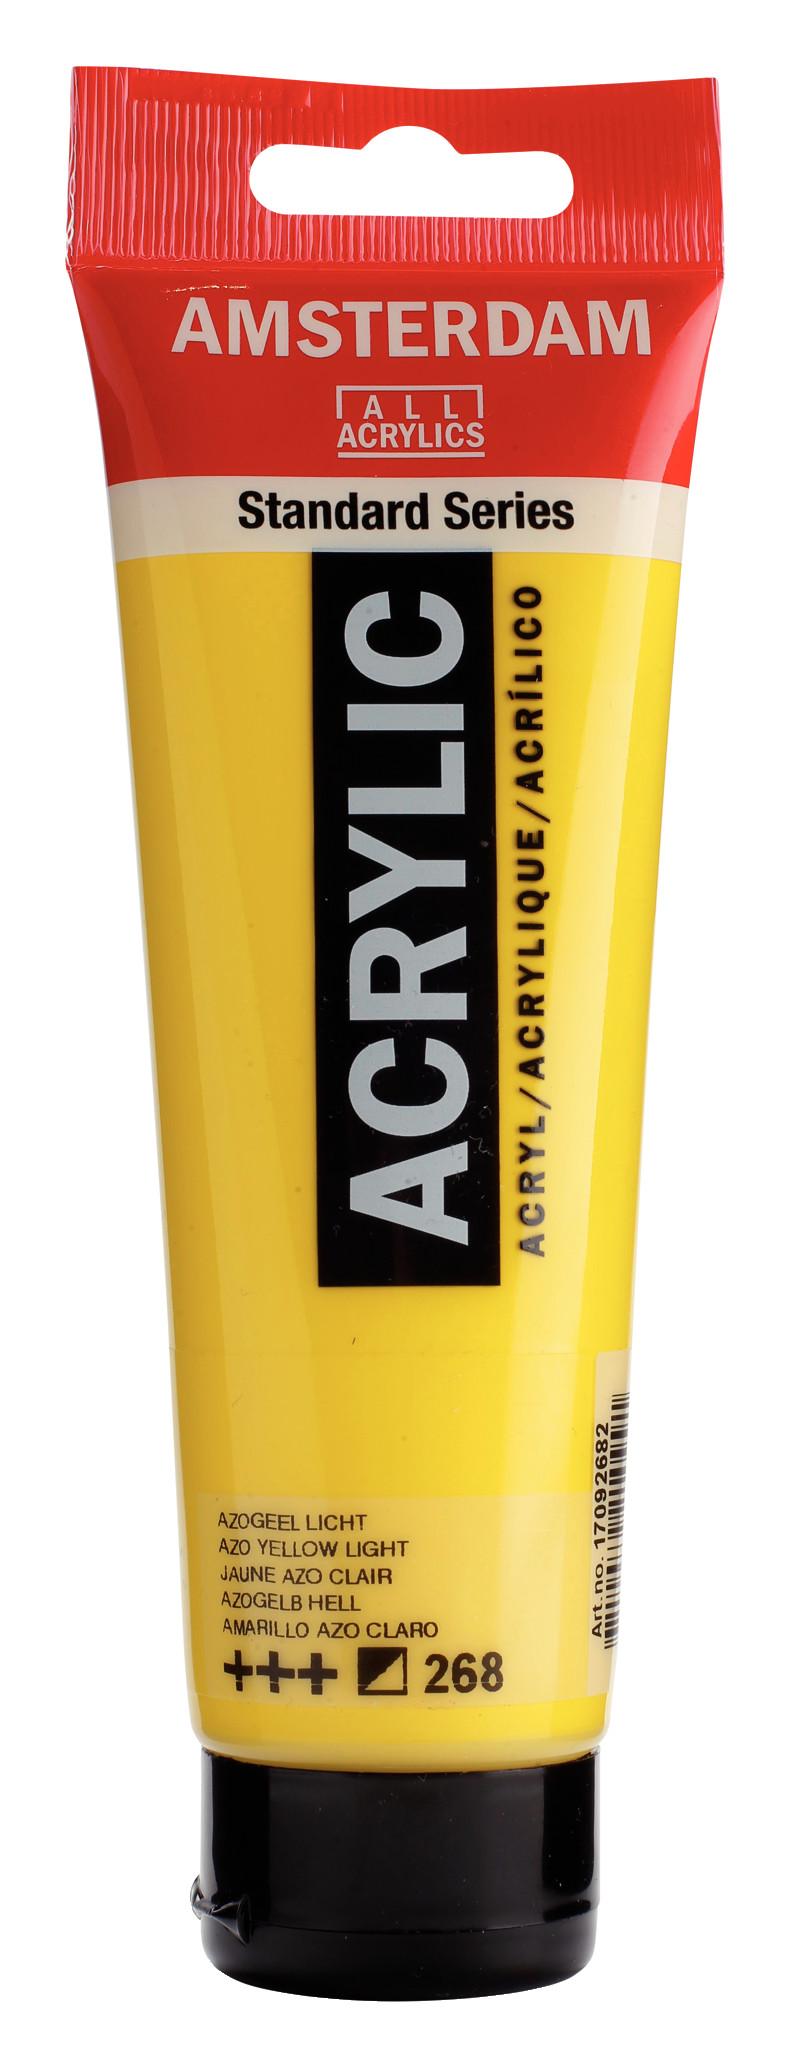 Amsterdam Standard Series Acrylic Tube 120 ml Azo yellow light 268